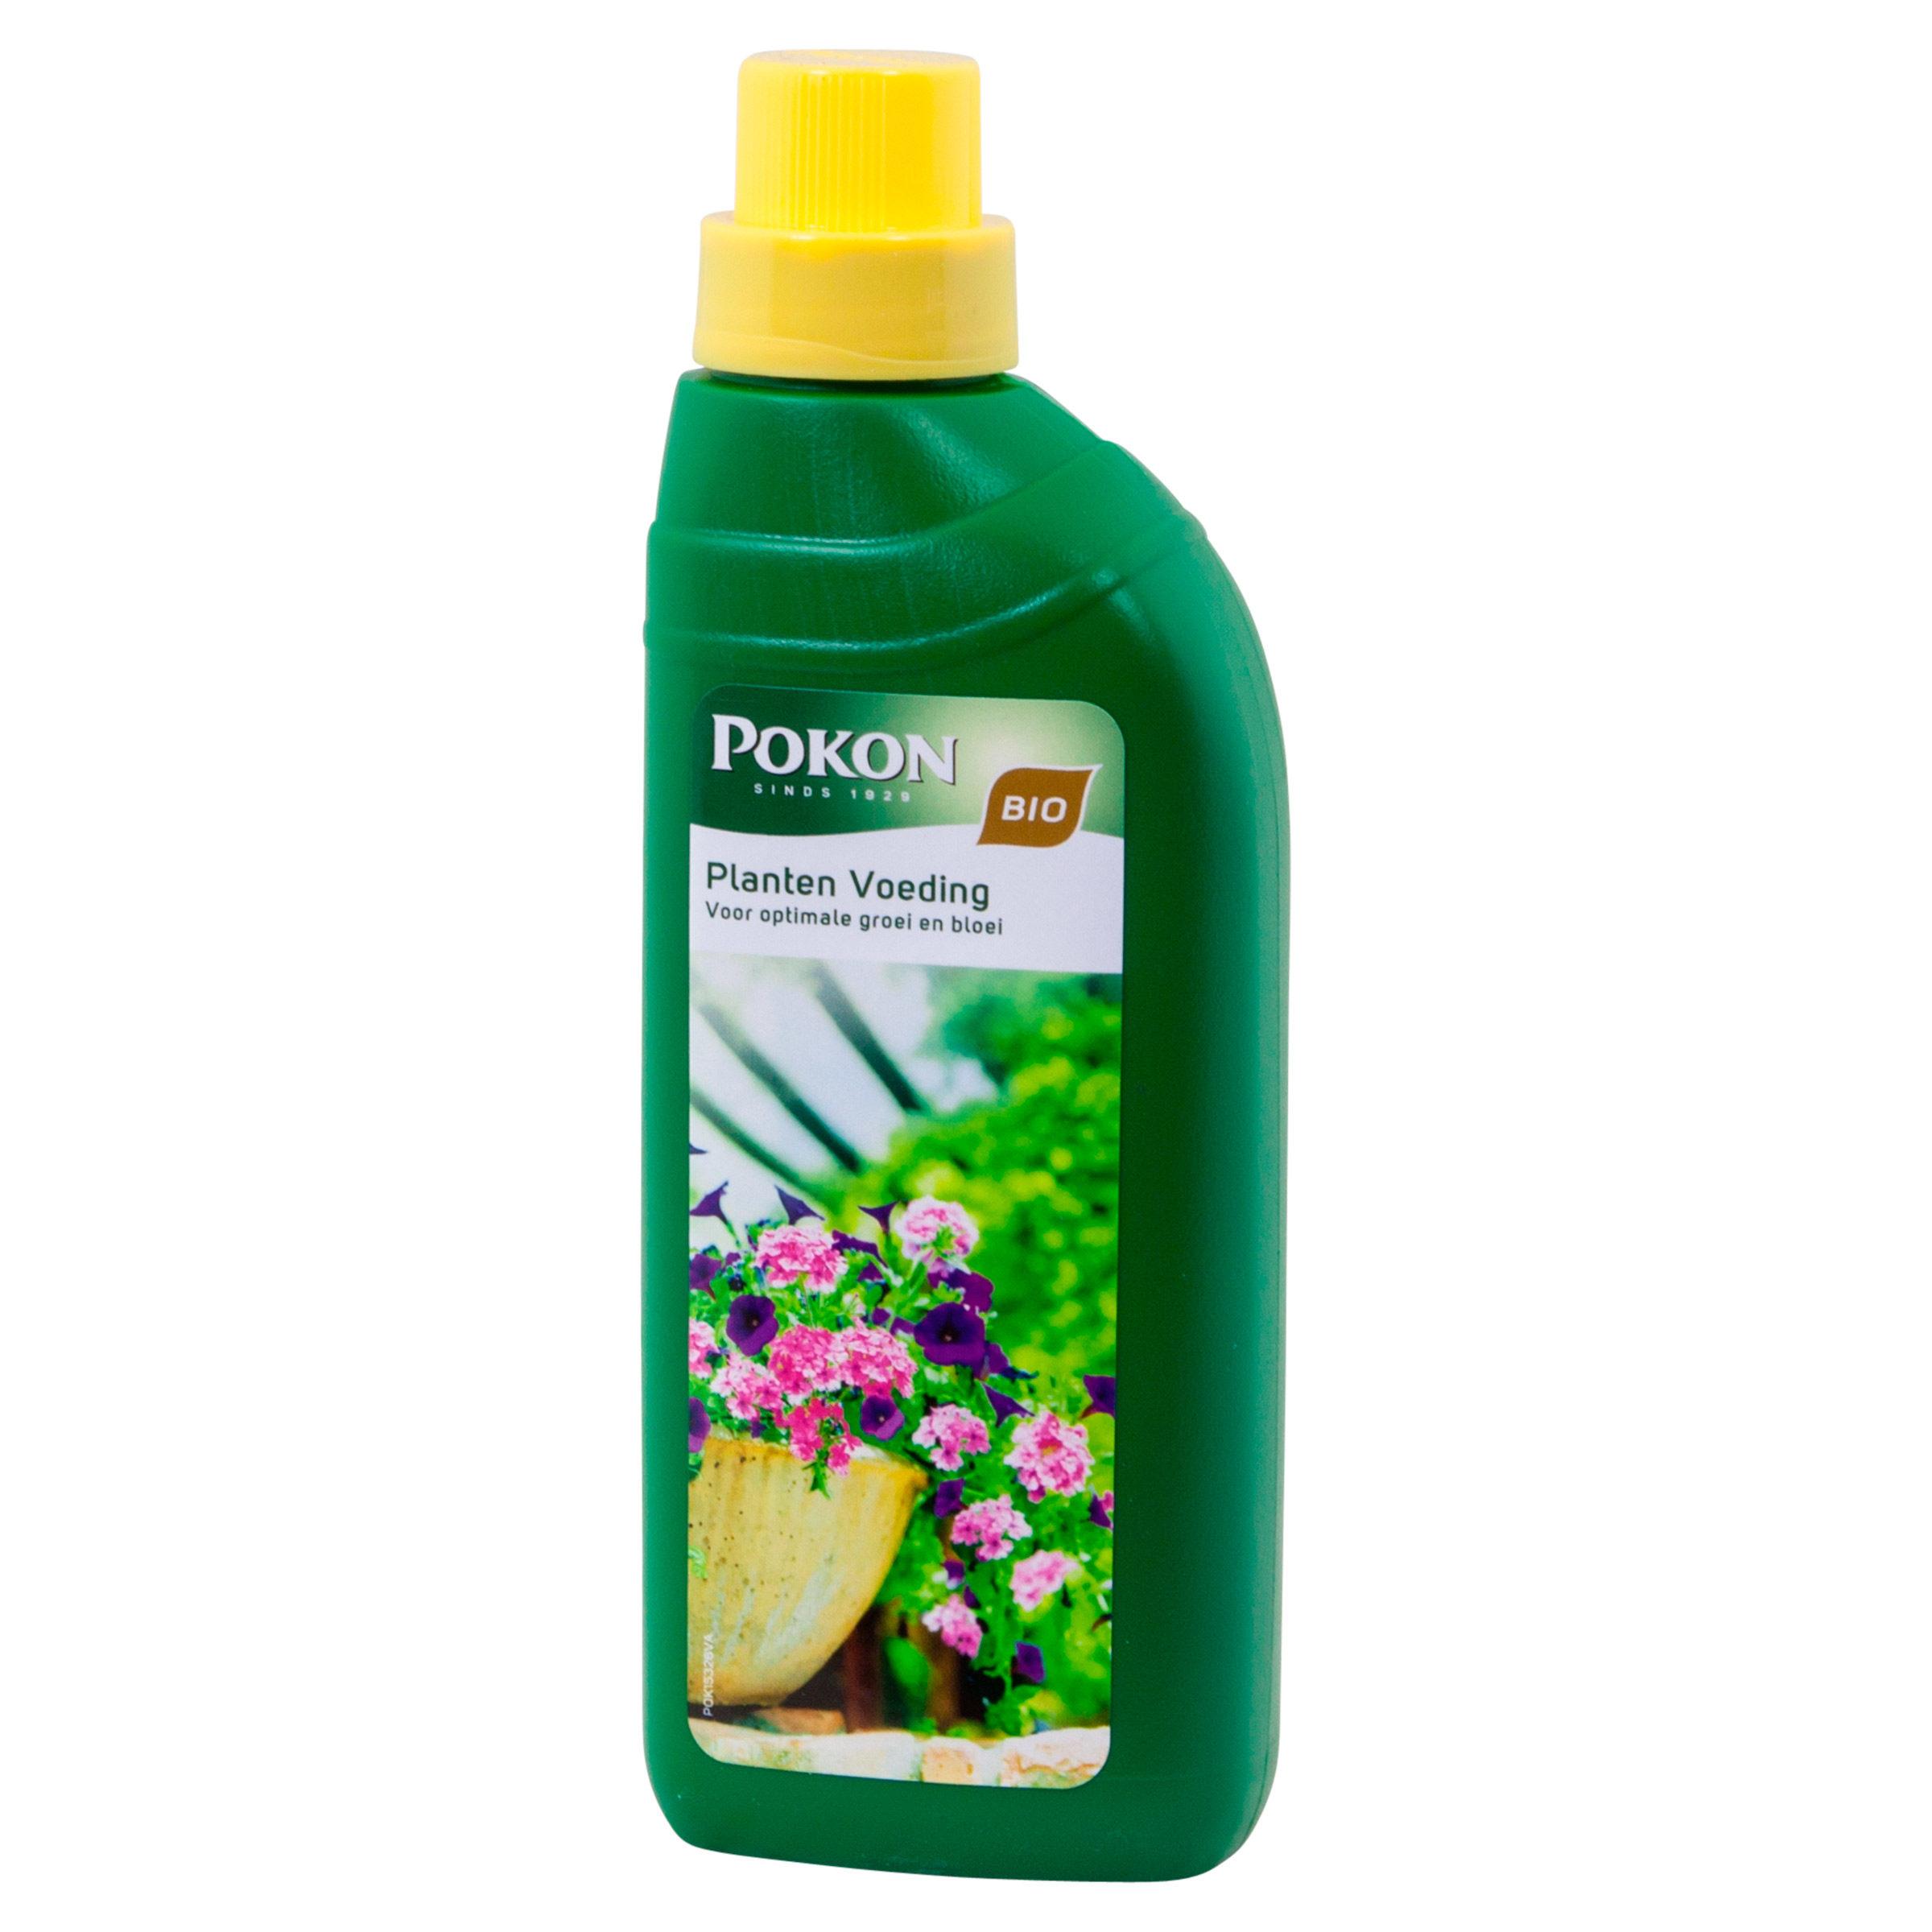 Pokon Biologische Plantenvoeding 500ml